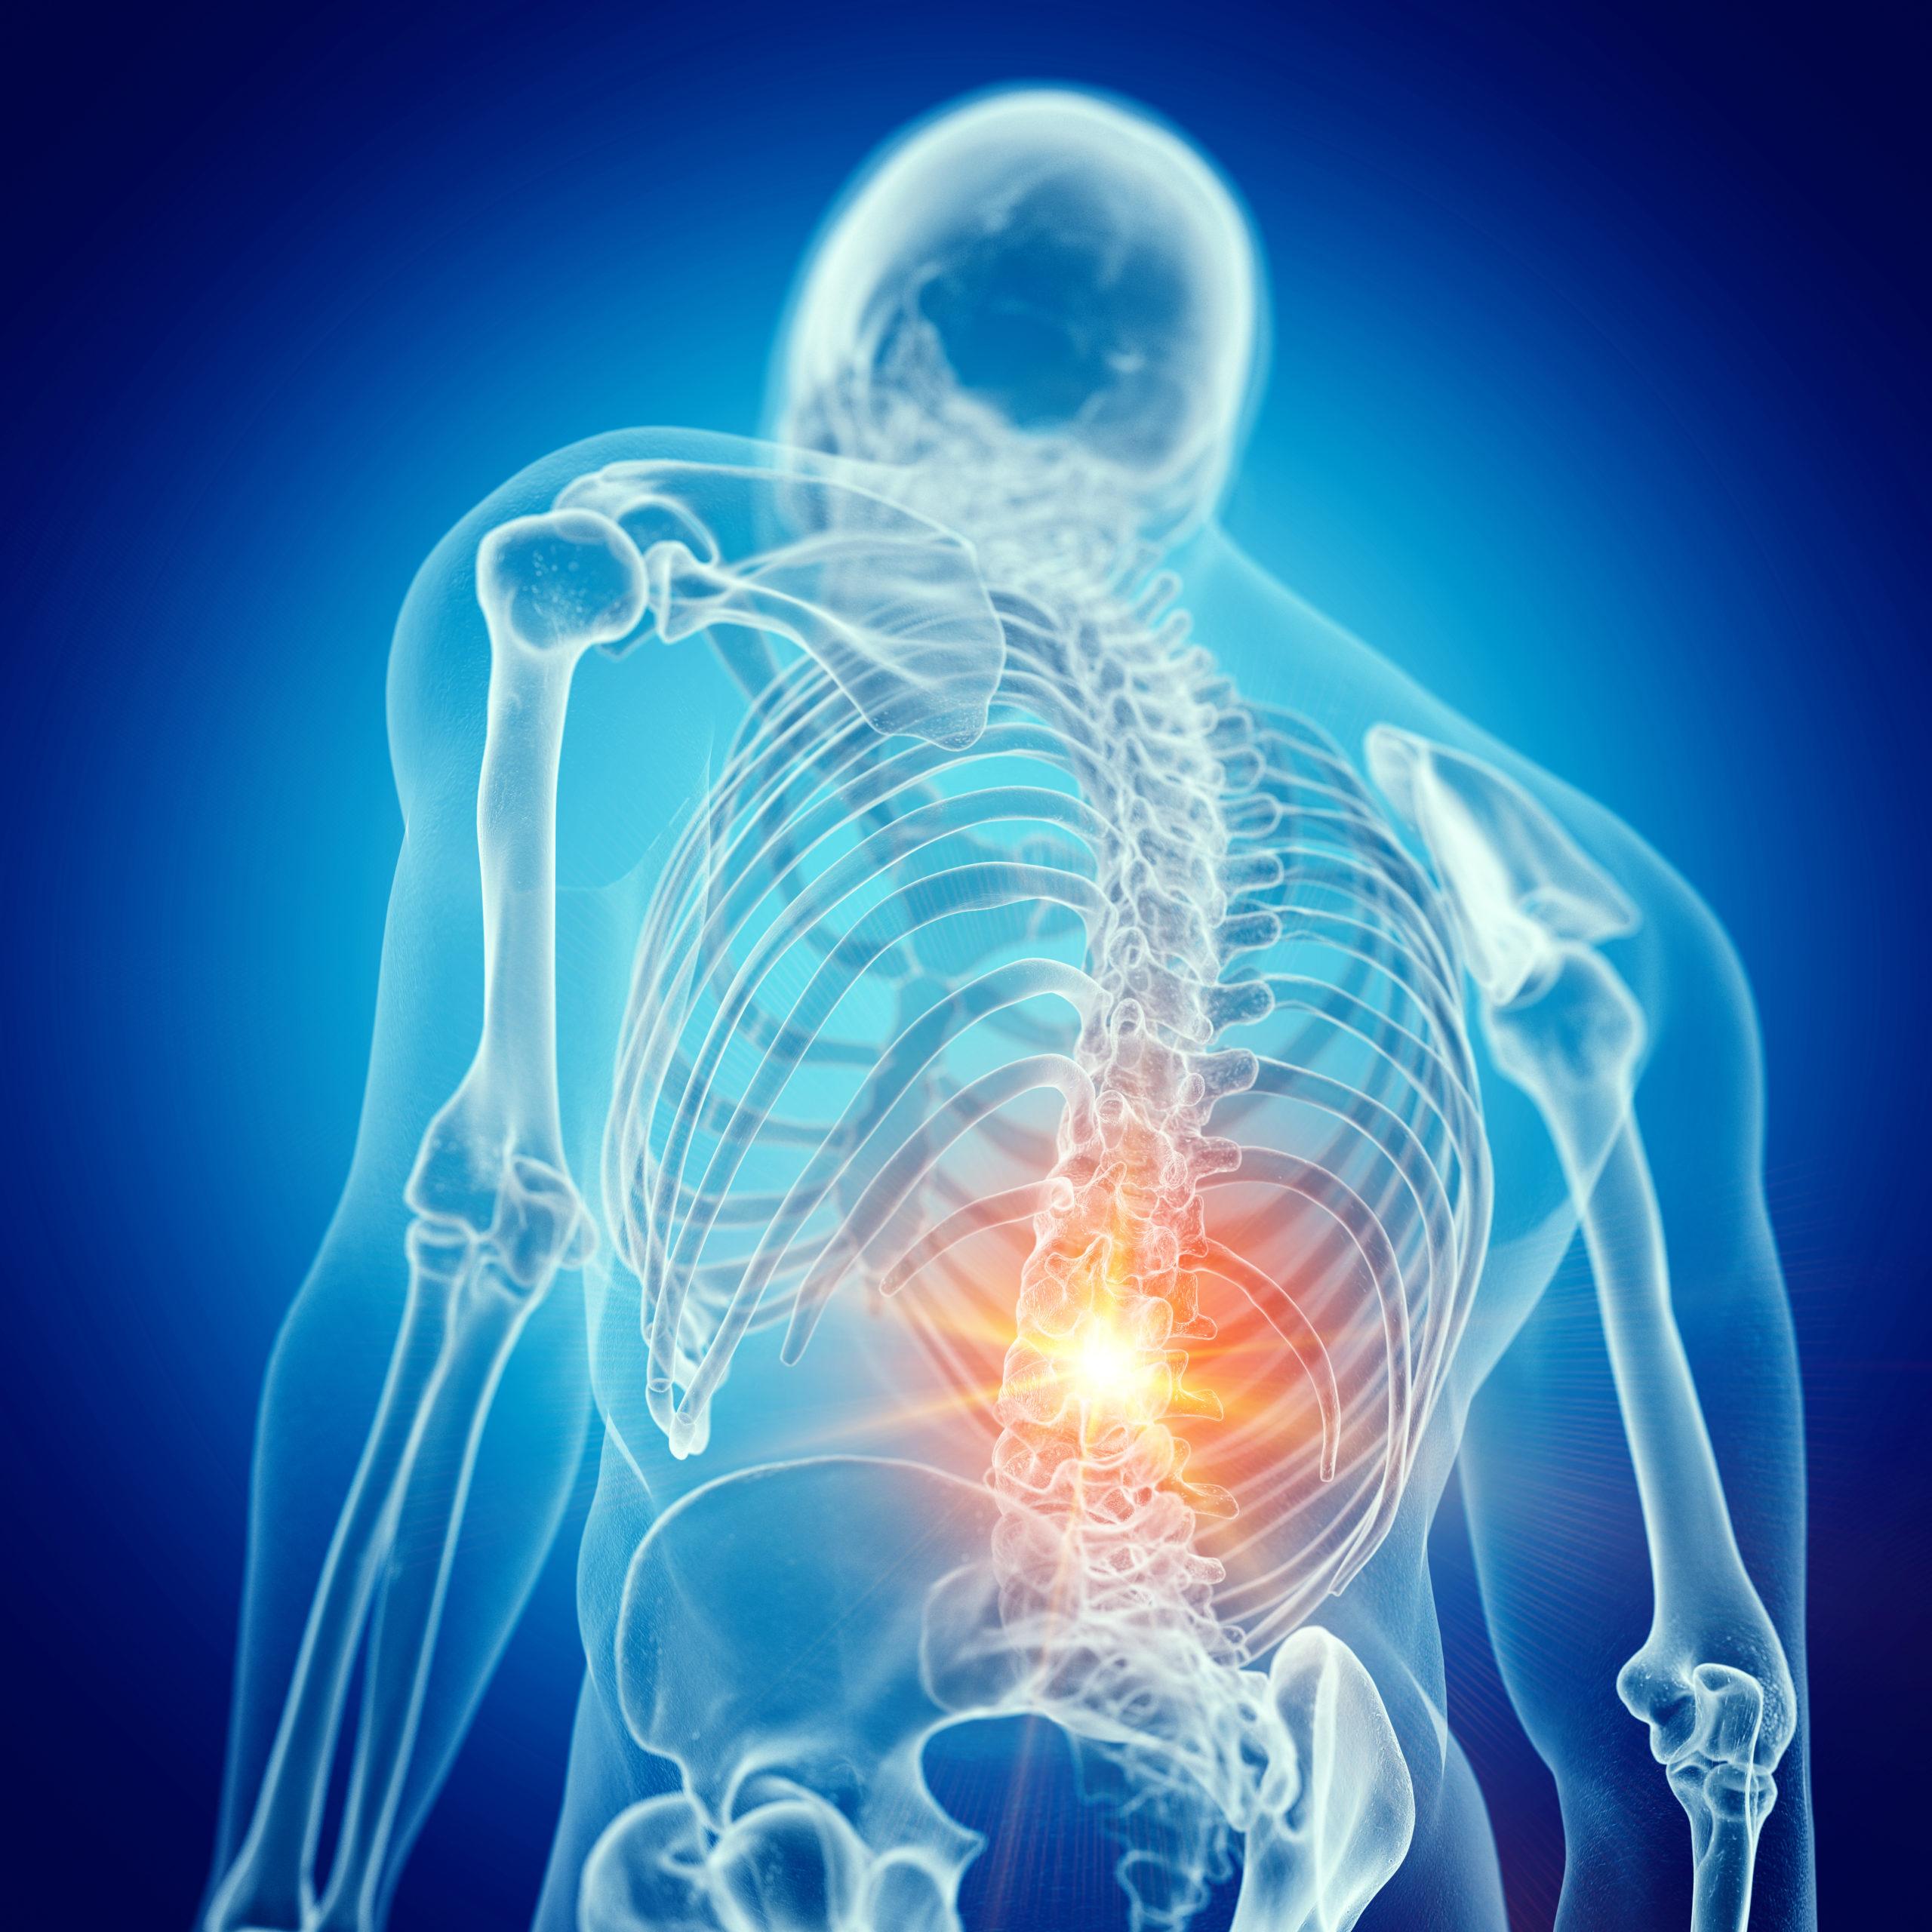 Lower Back Pain: Causes, Symptoms, Treatments